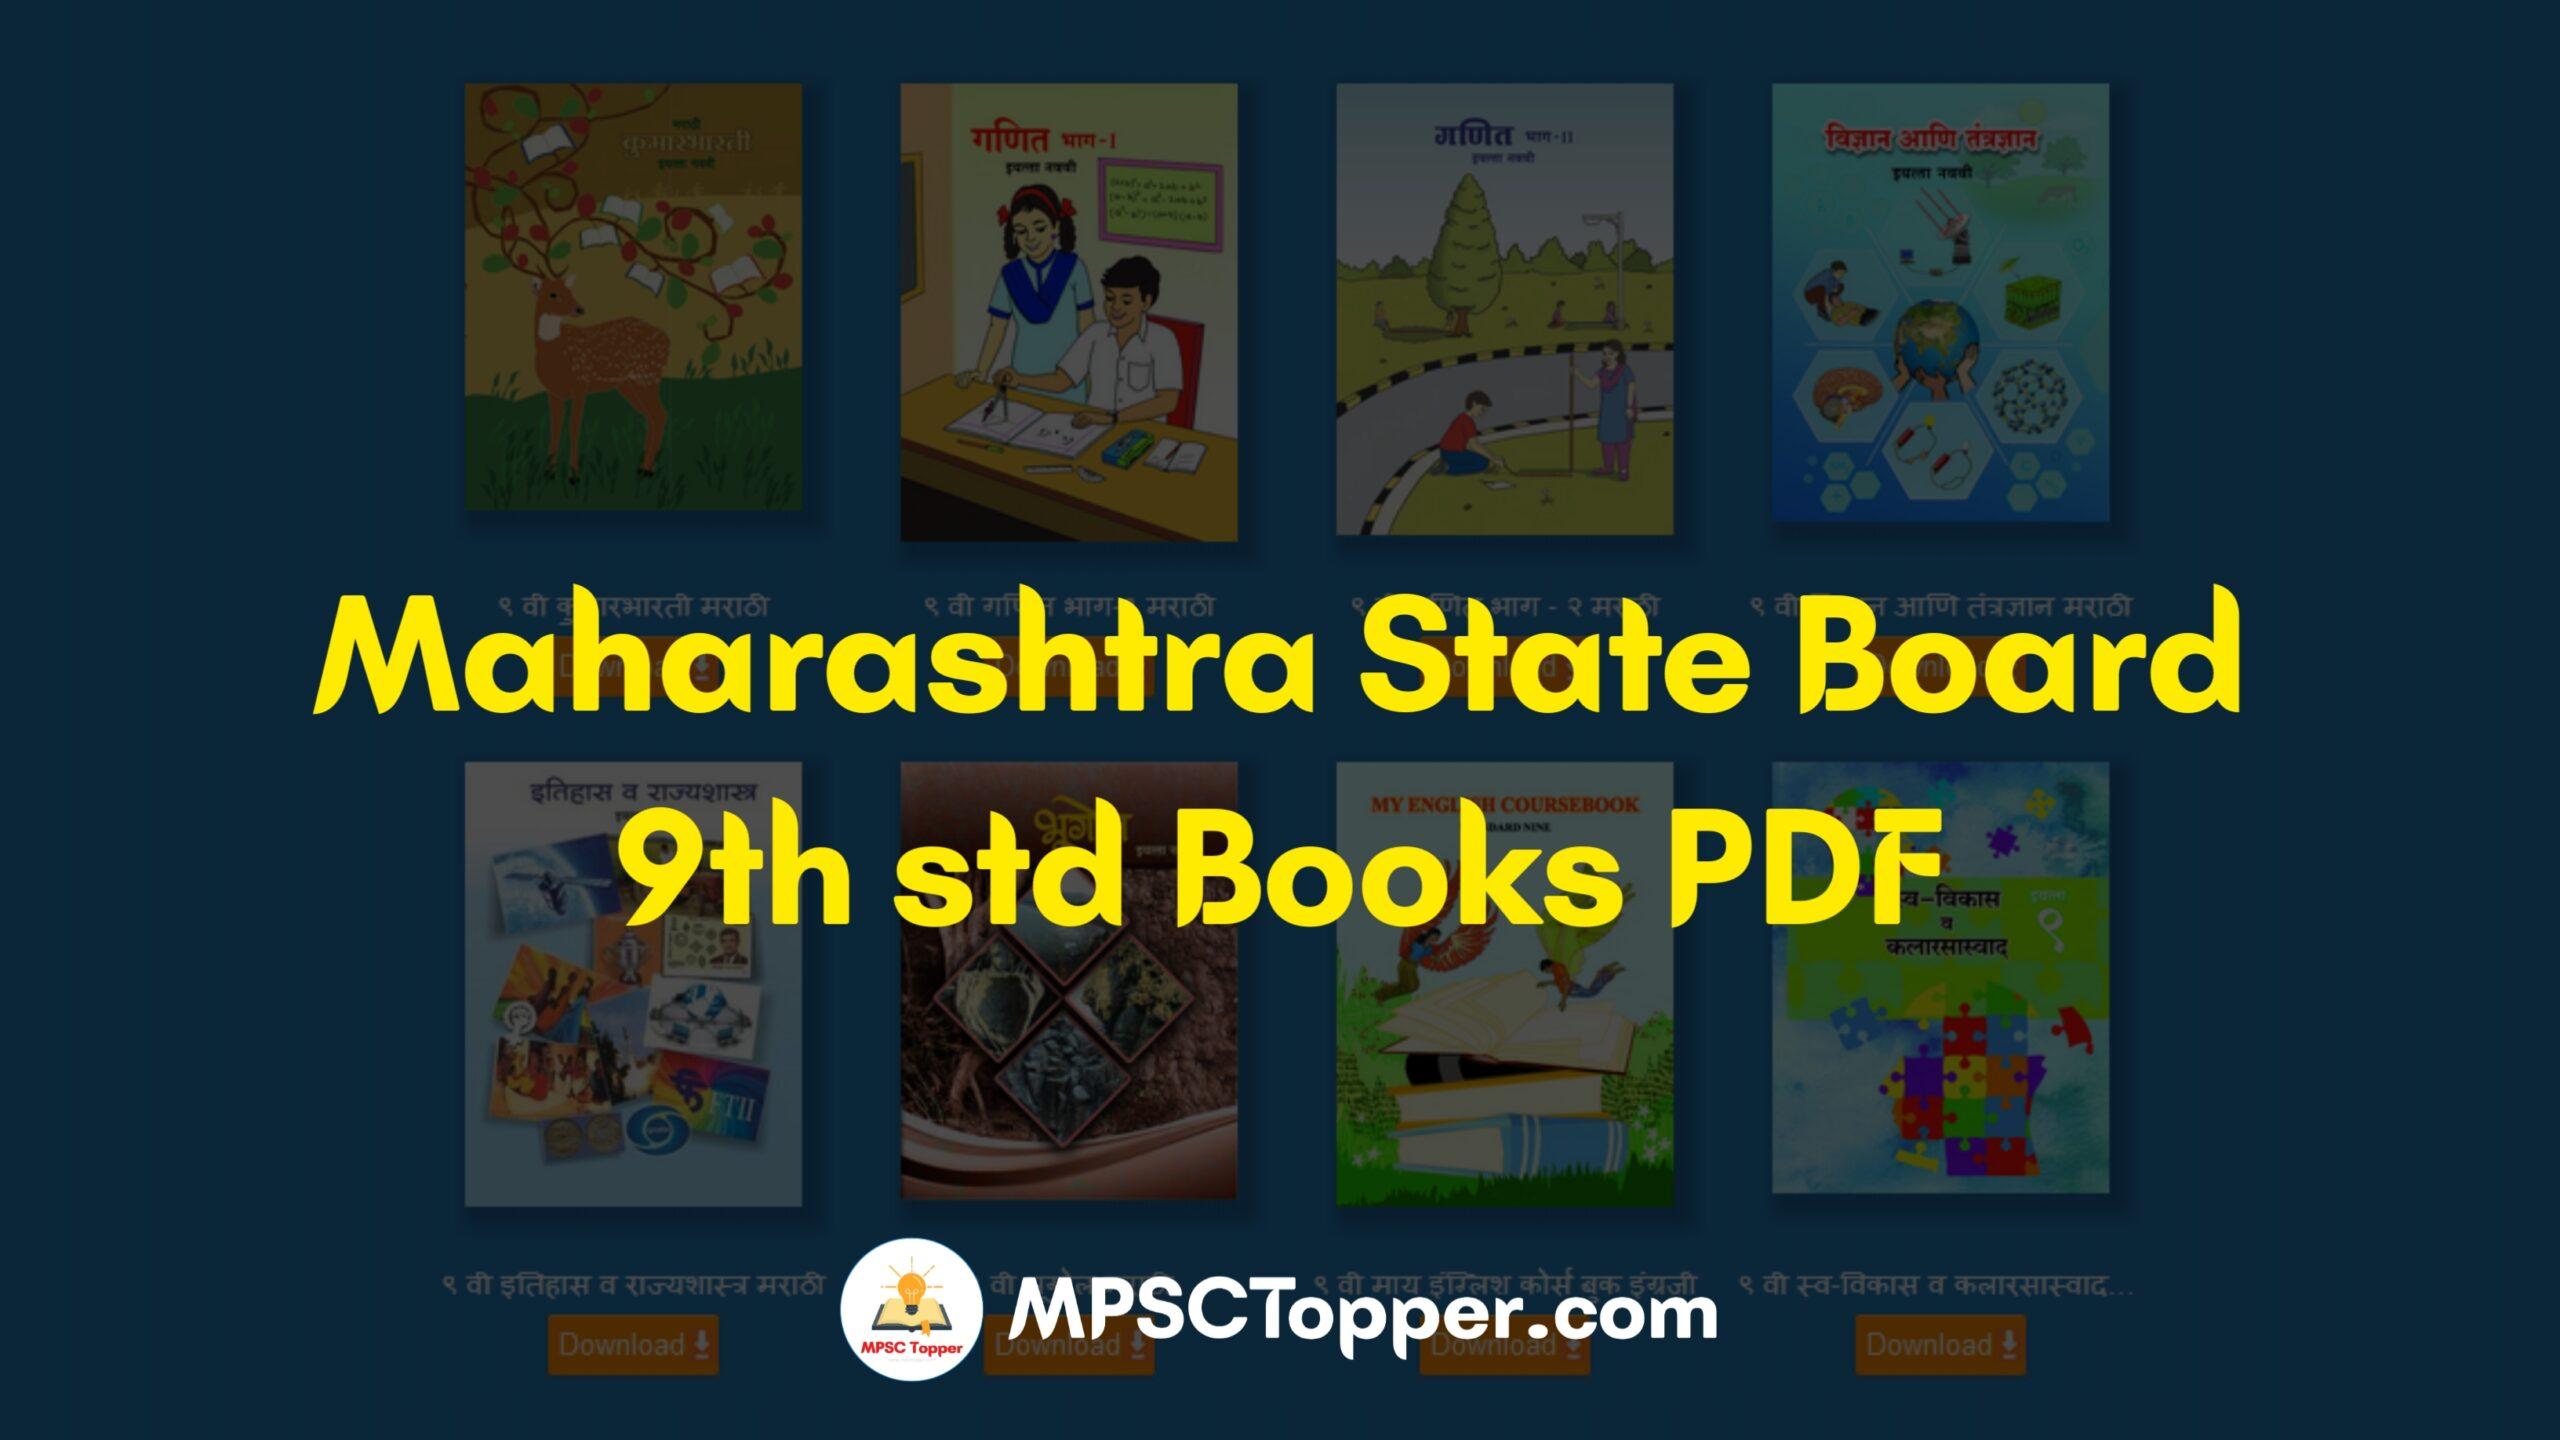 9th std Books PDF